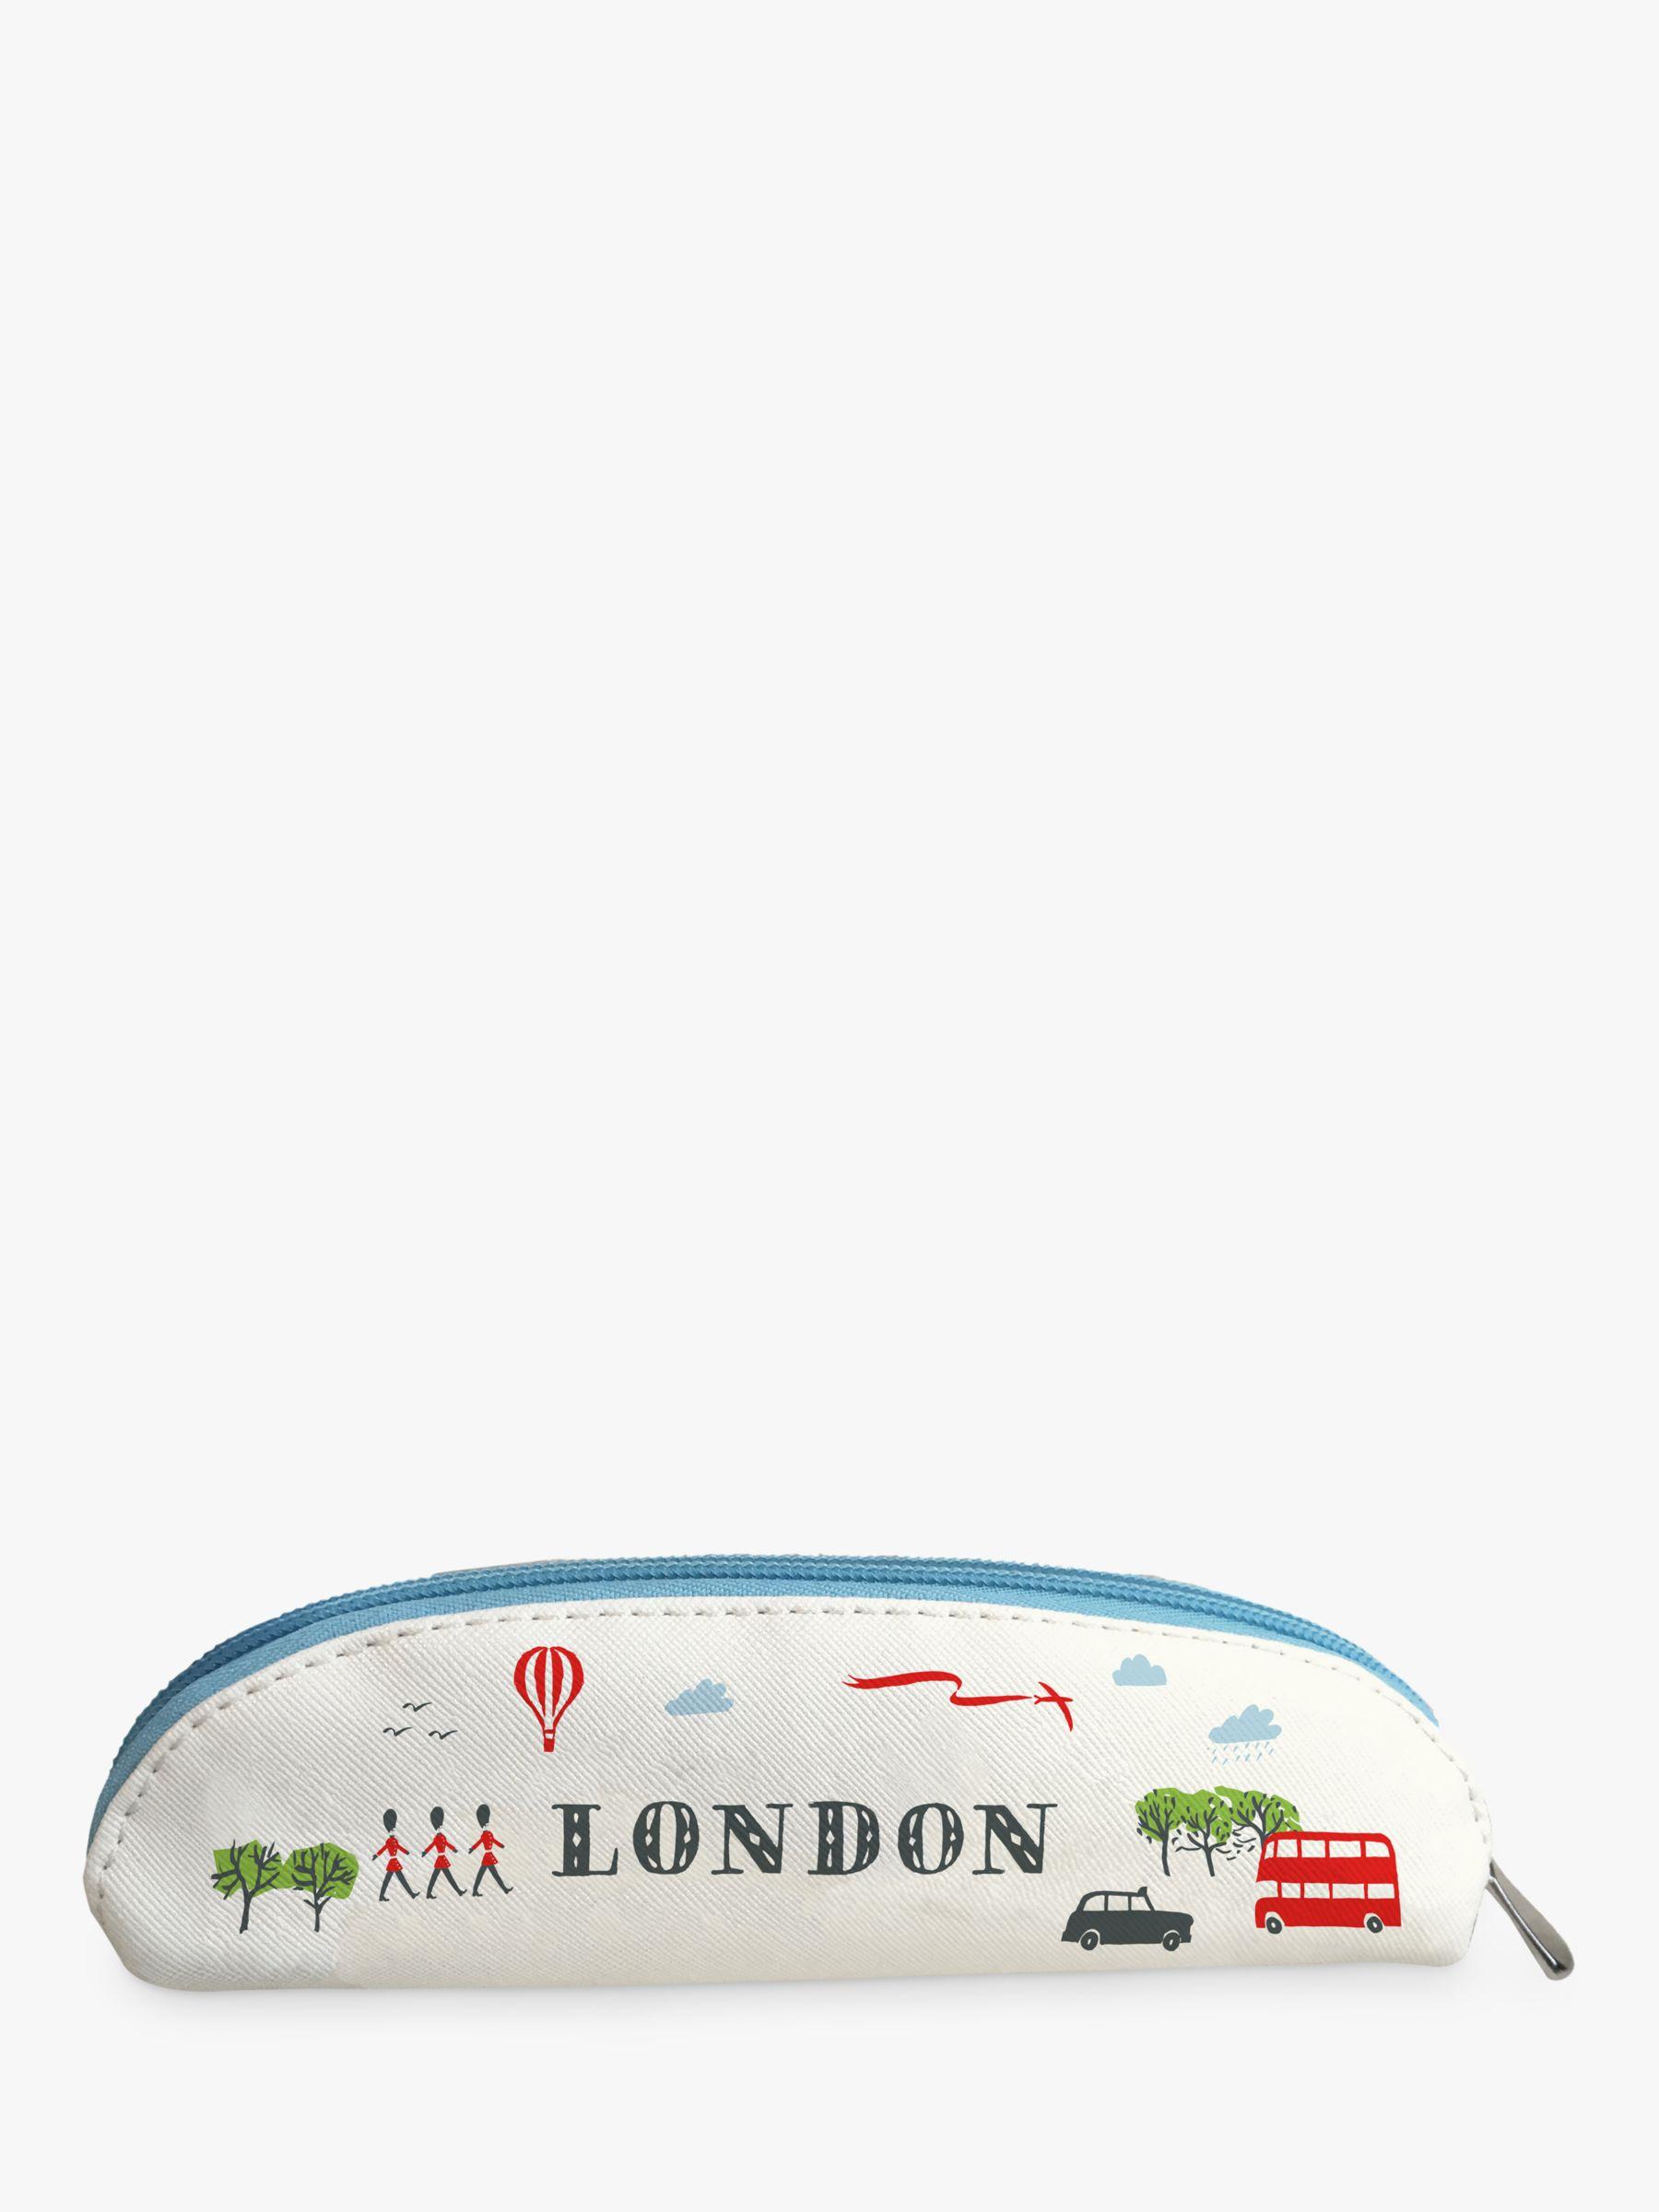 Alice Tait Alice Tait London Pencil Case